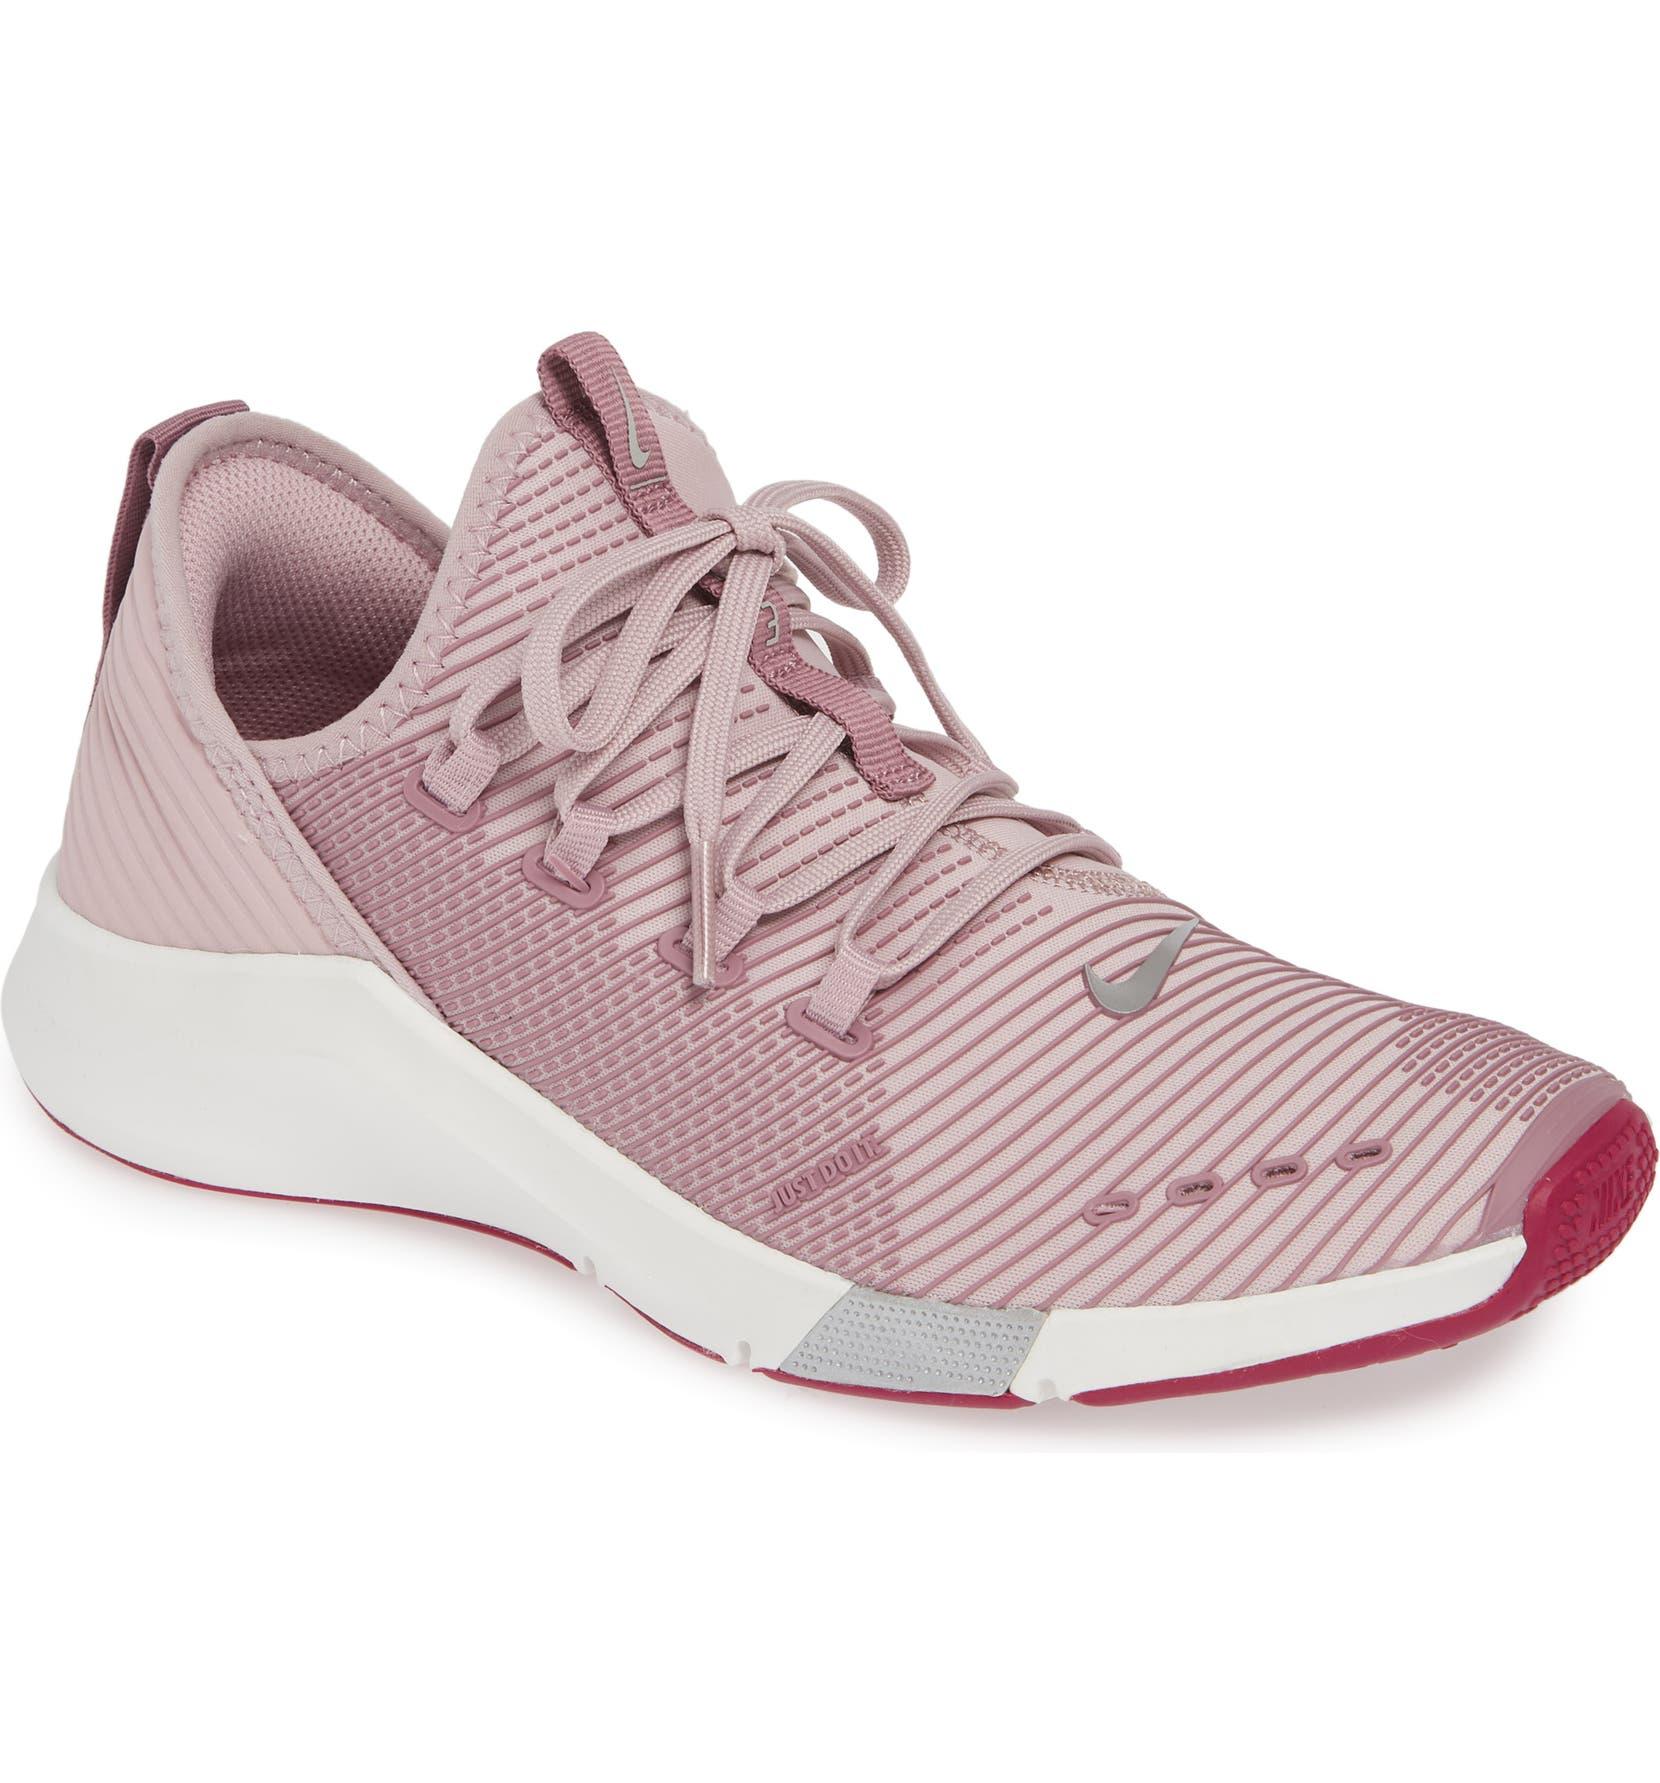 more photos 1eb35 65ea6 Nike Air Zoom Elevate Training Shoe (Women)   Nordstrom